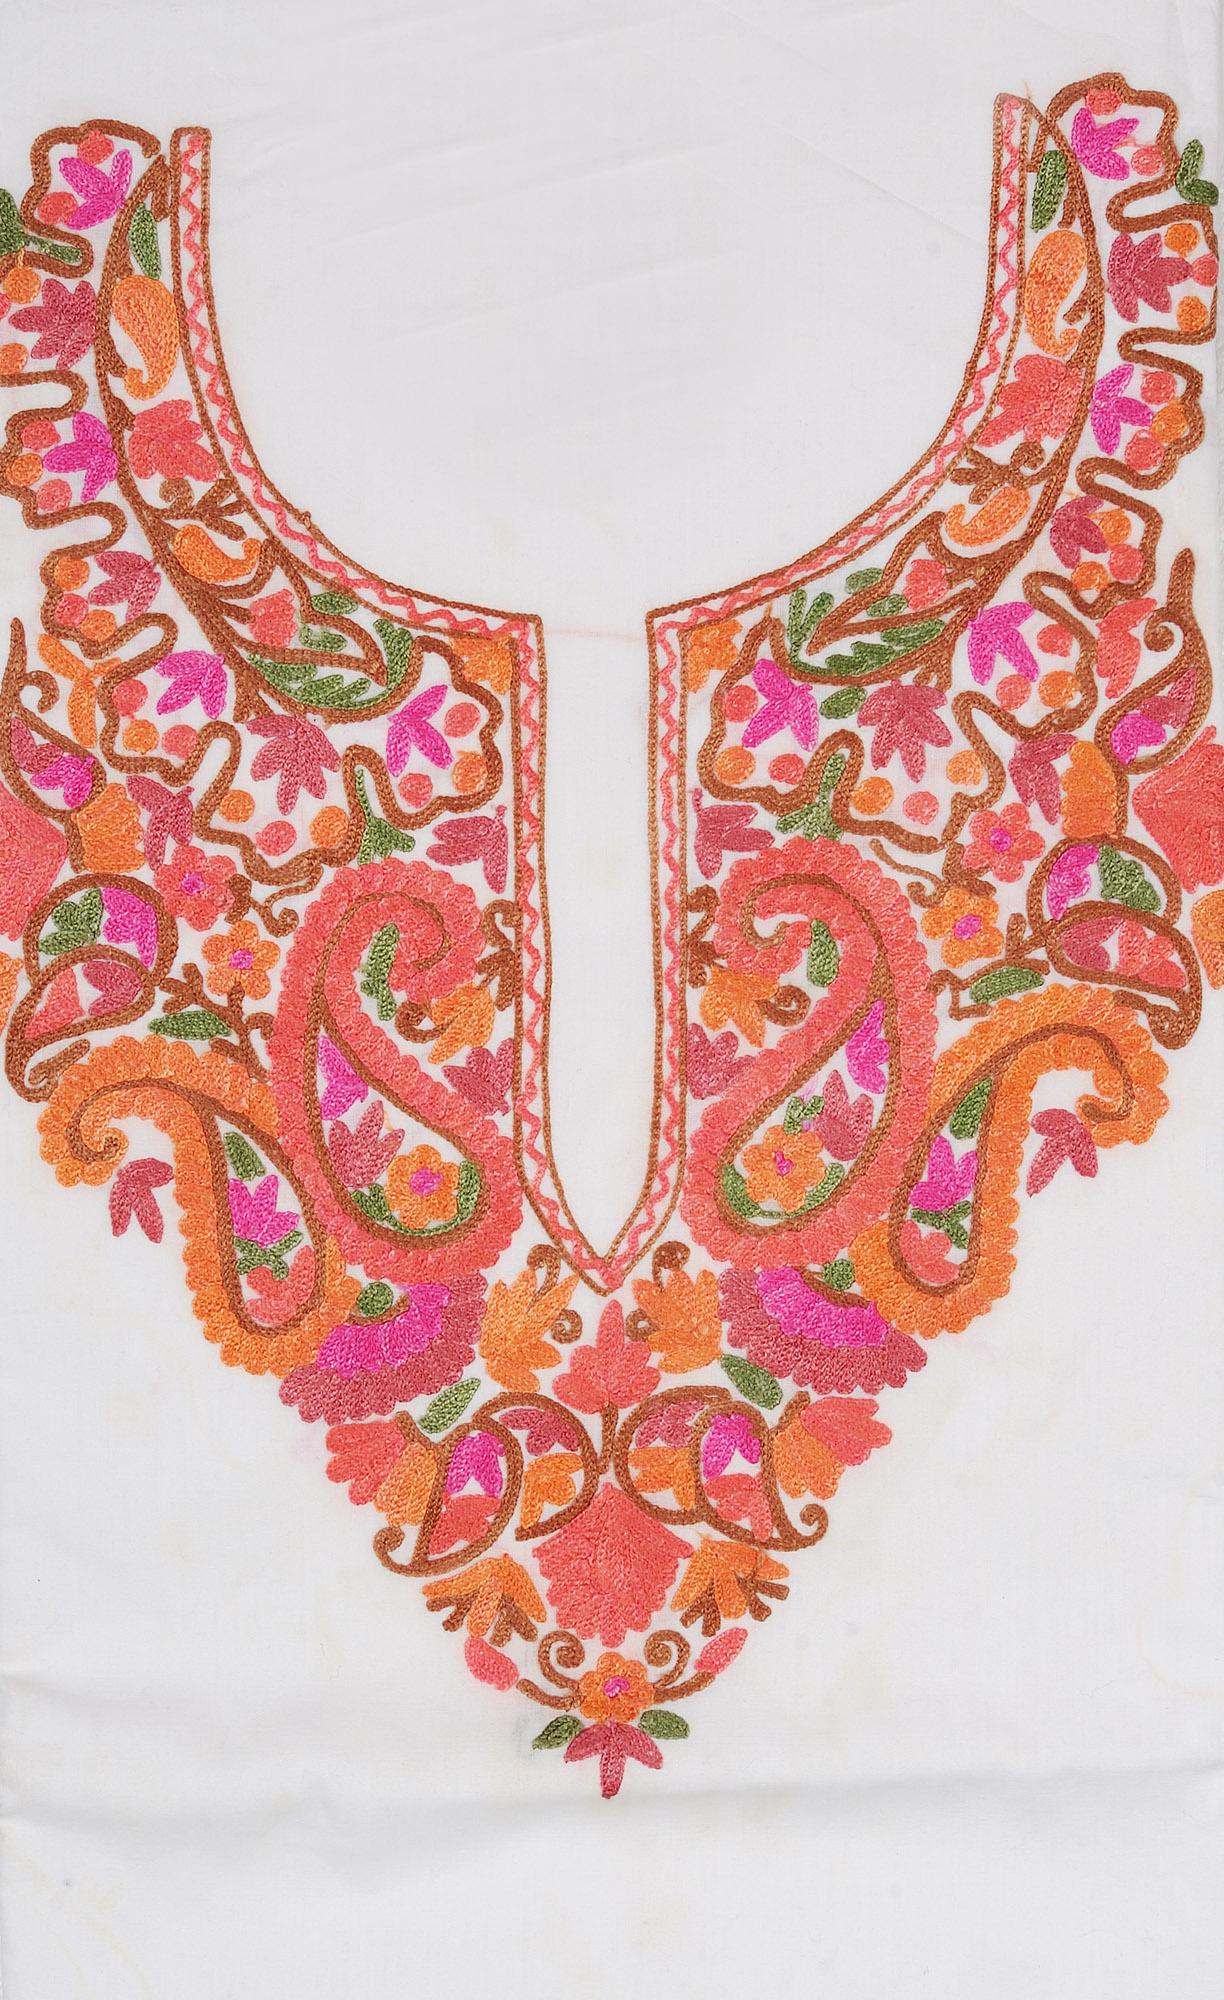 ChicWhite TwoPiece Salwar Kameez Fabric From Kashmir